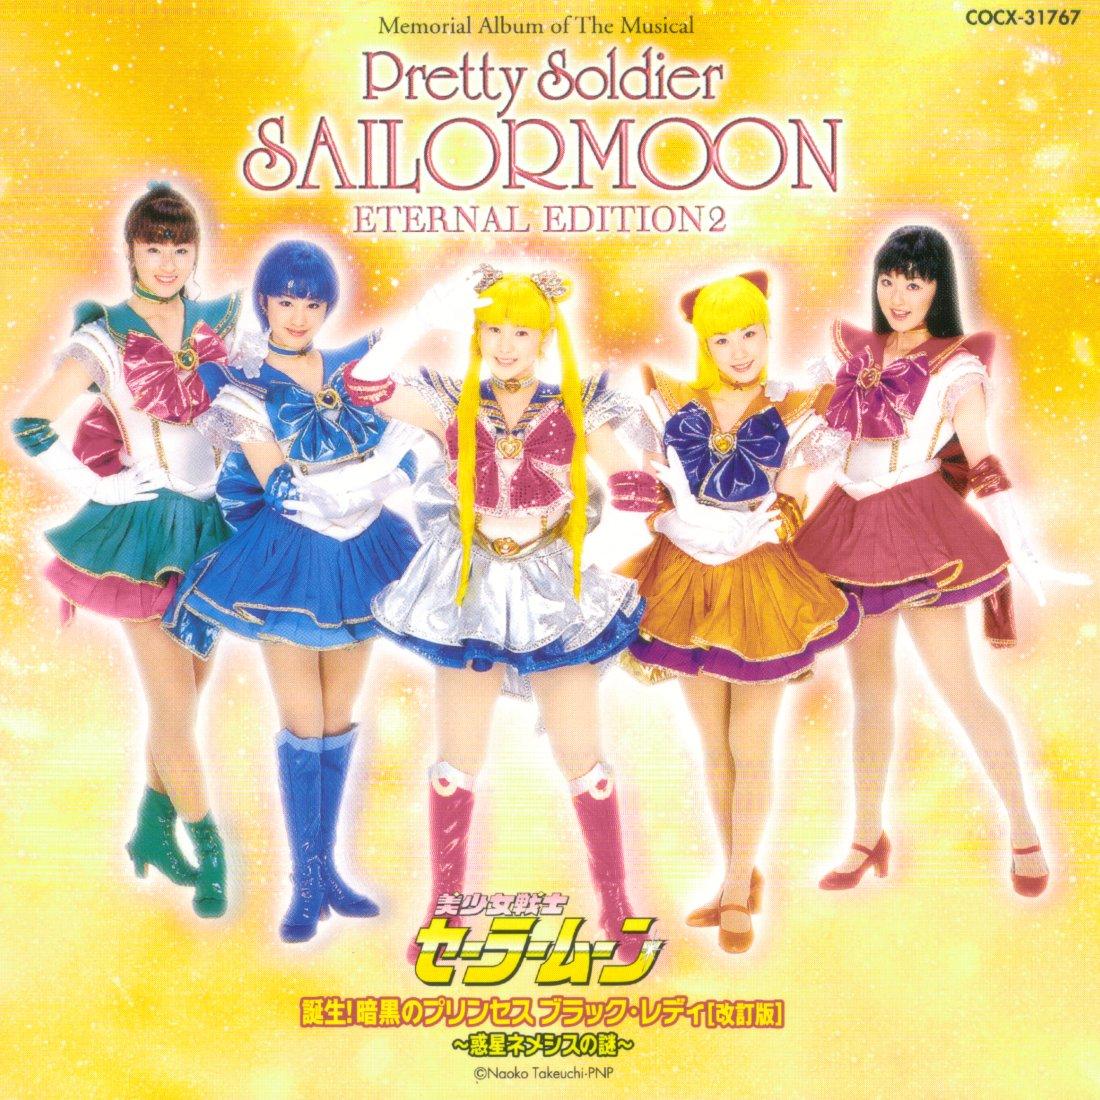 Memorial Album of the Musical - Pretty Soldier Sailor Moon ~ Eternal Edition 2